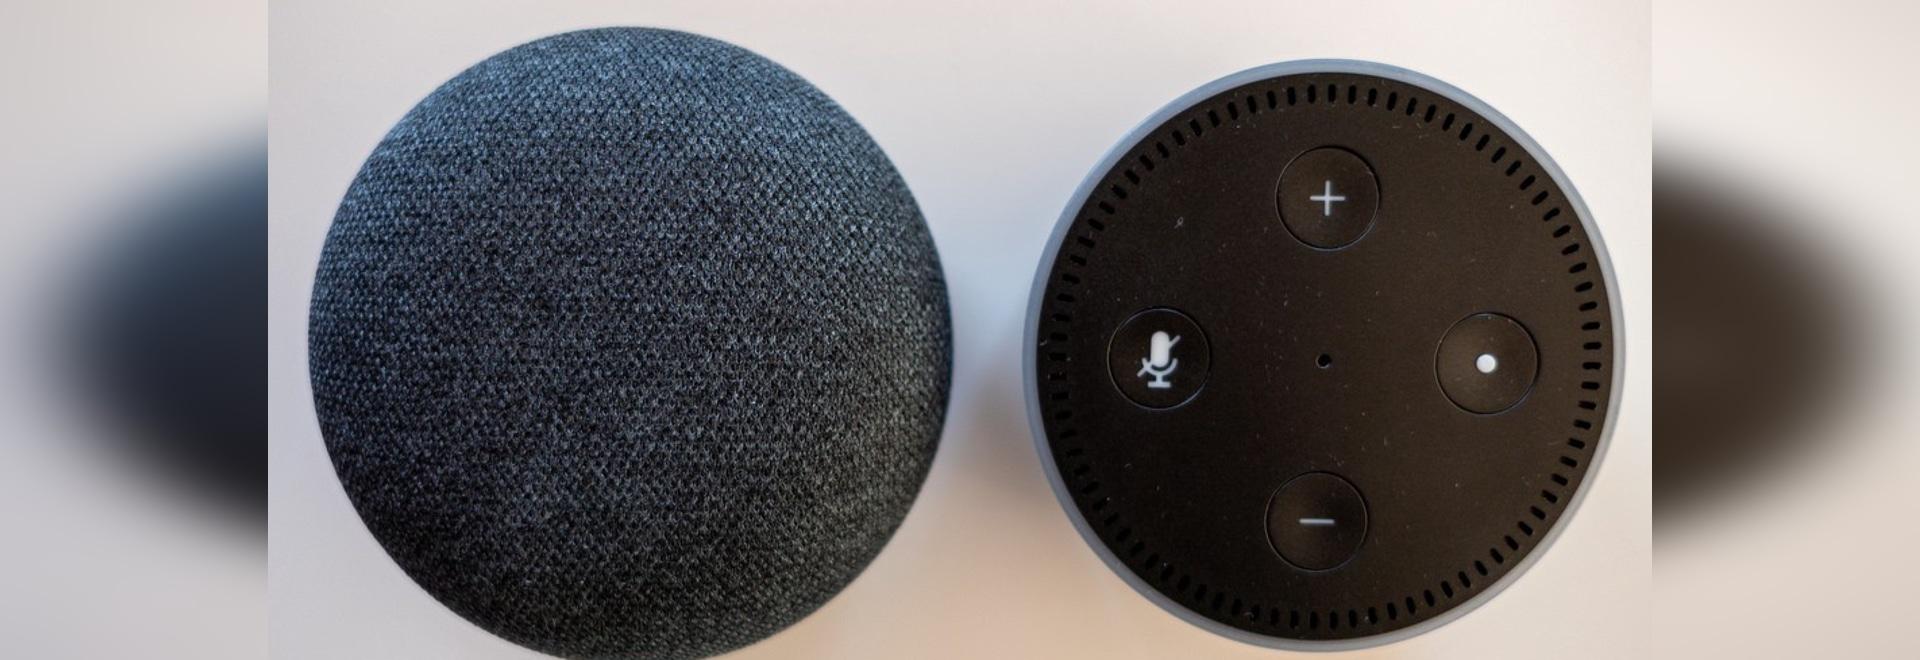 Amazon Echo Dot and Google Home Mini